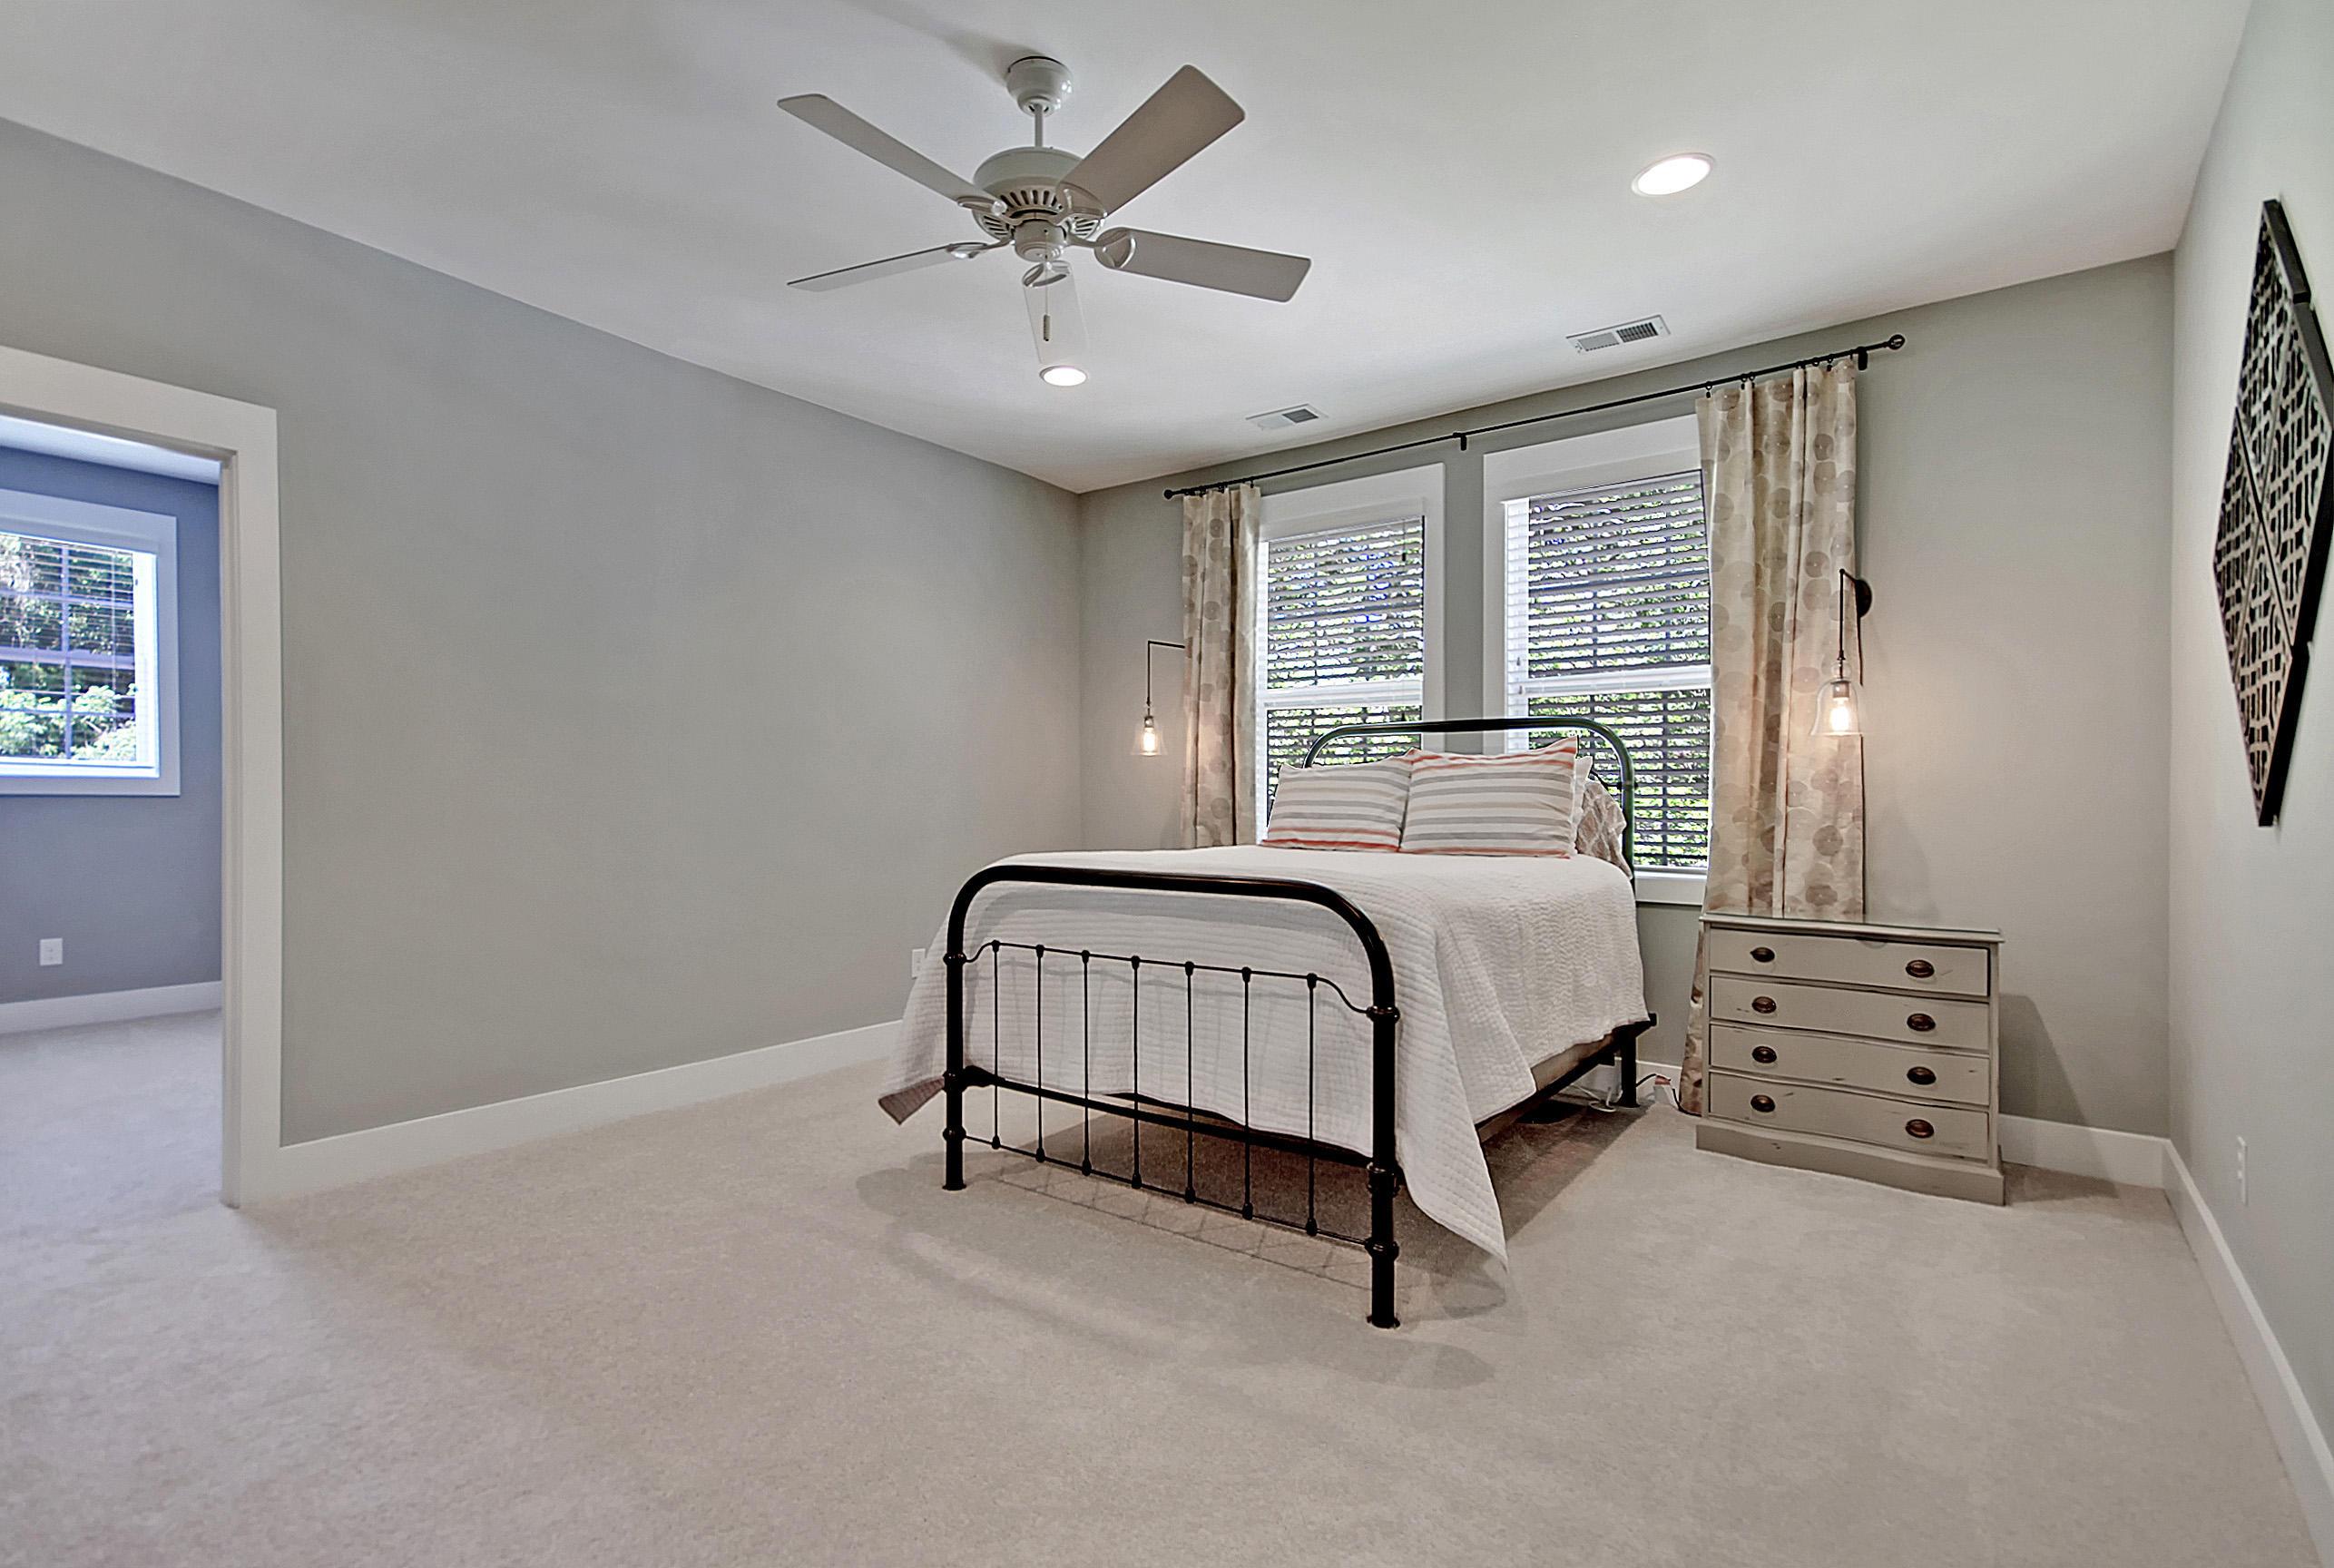 Riverland Terrace Homes For Sale - 2153 Fort Pemberton, Charleston, SC - 53